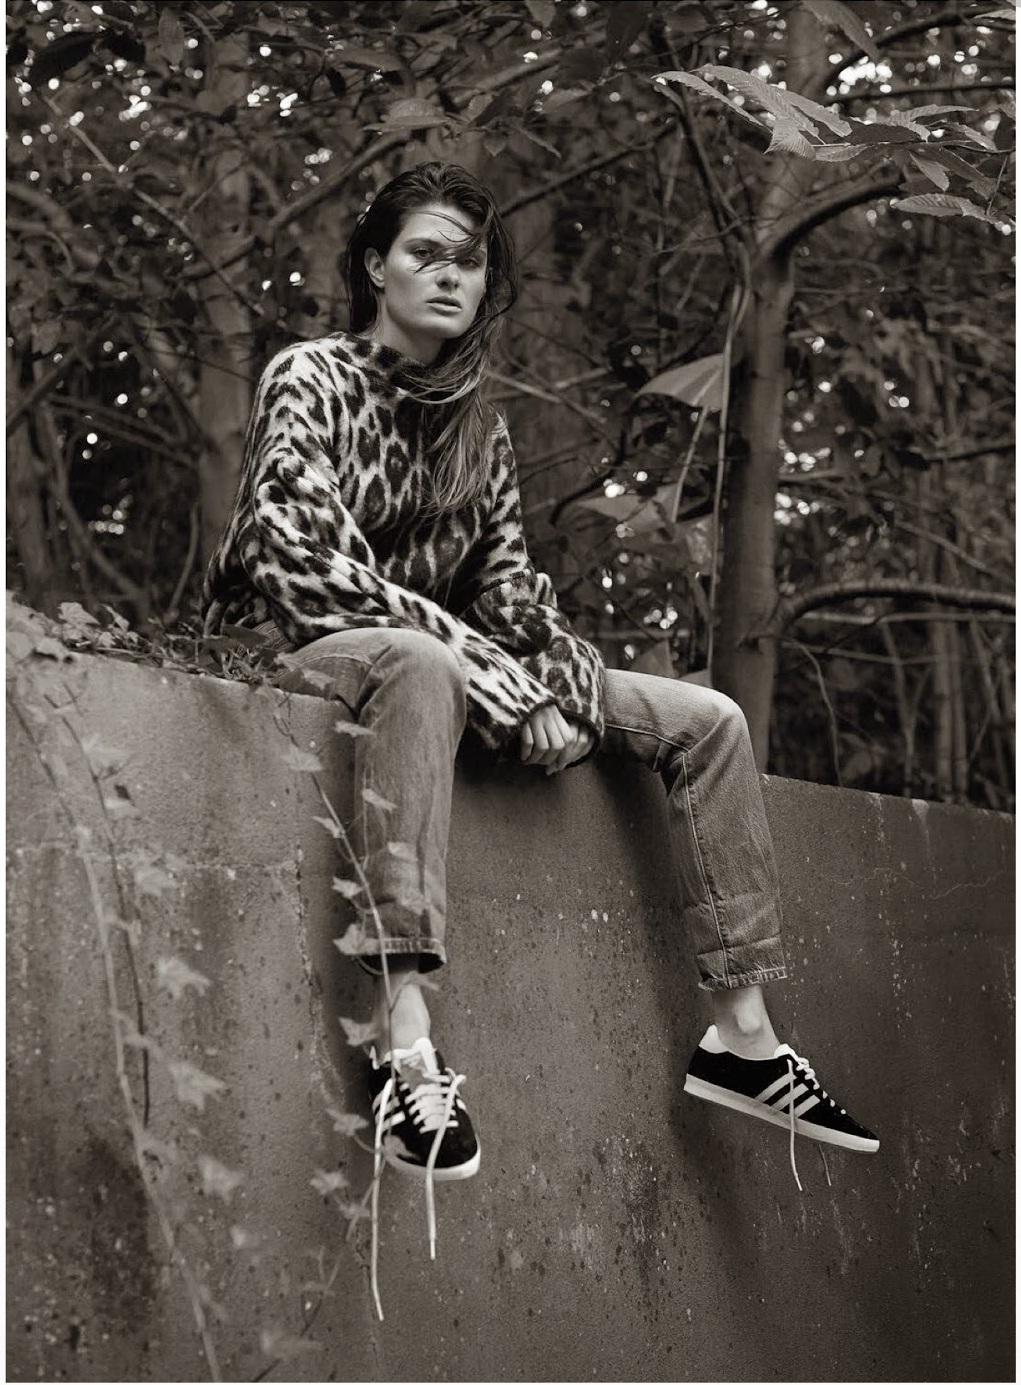 Clochet_Isabeli _Fontana _for _Vogue _Paris _November _2014_photography_by_Scott_Trindle_styling_Geraldine_Saglio_10